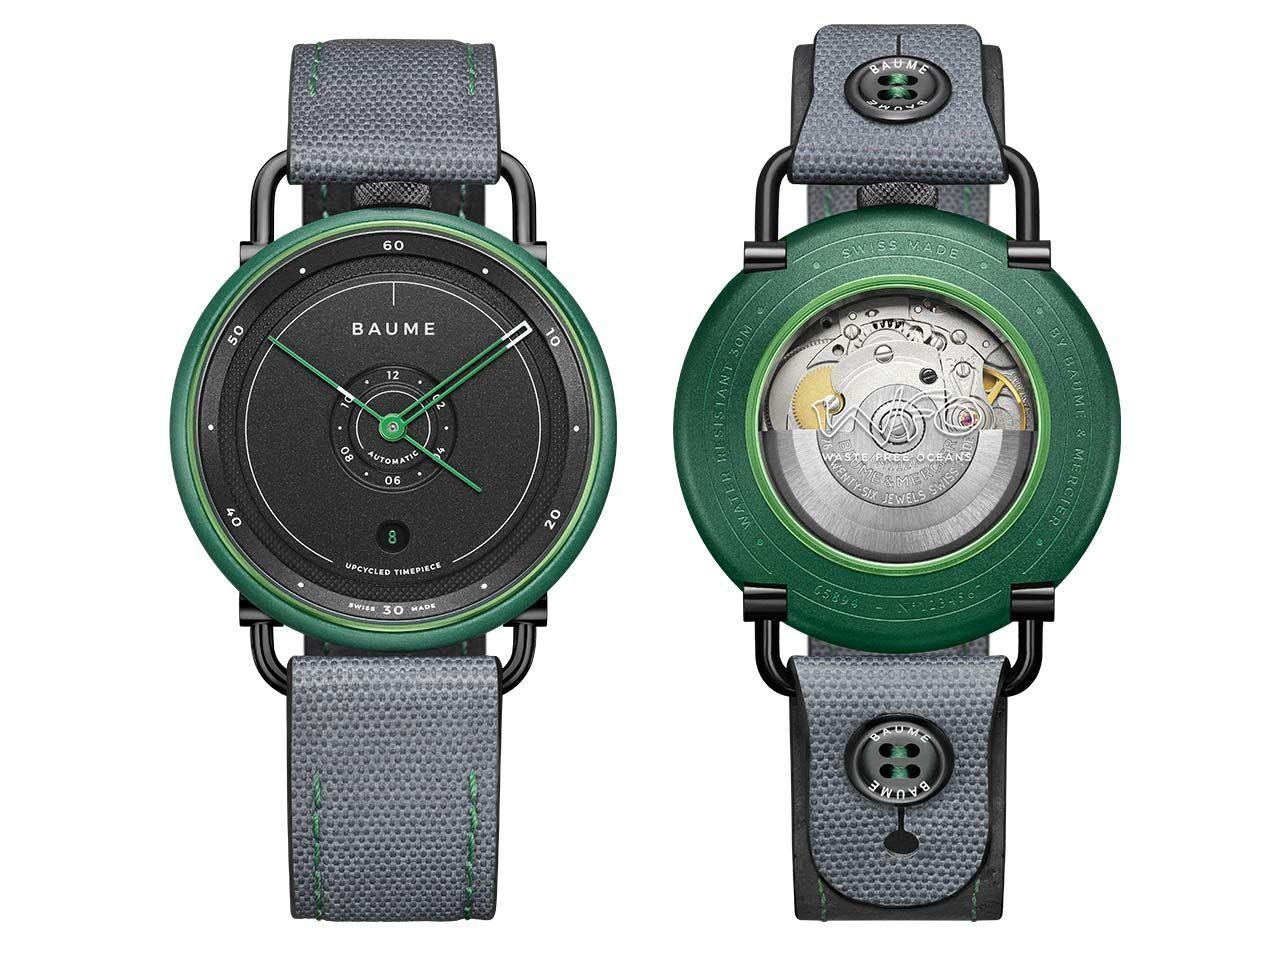 Baume et Mercier Baume Ocean Limited Edition - zöld óra zöld színben